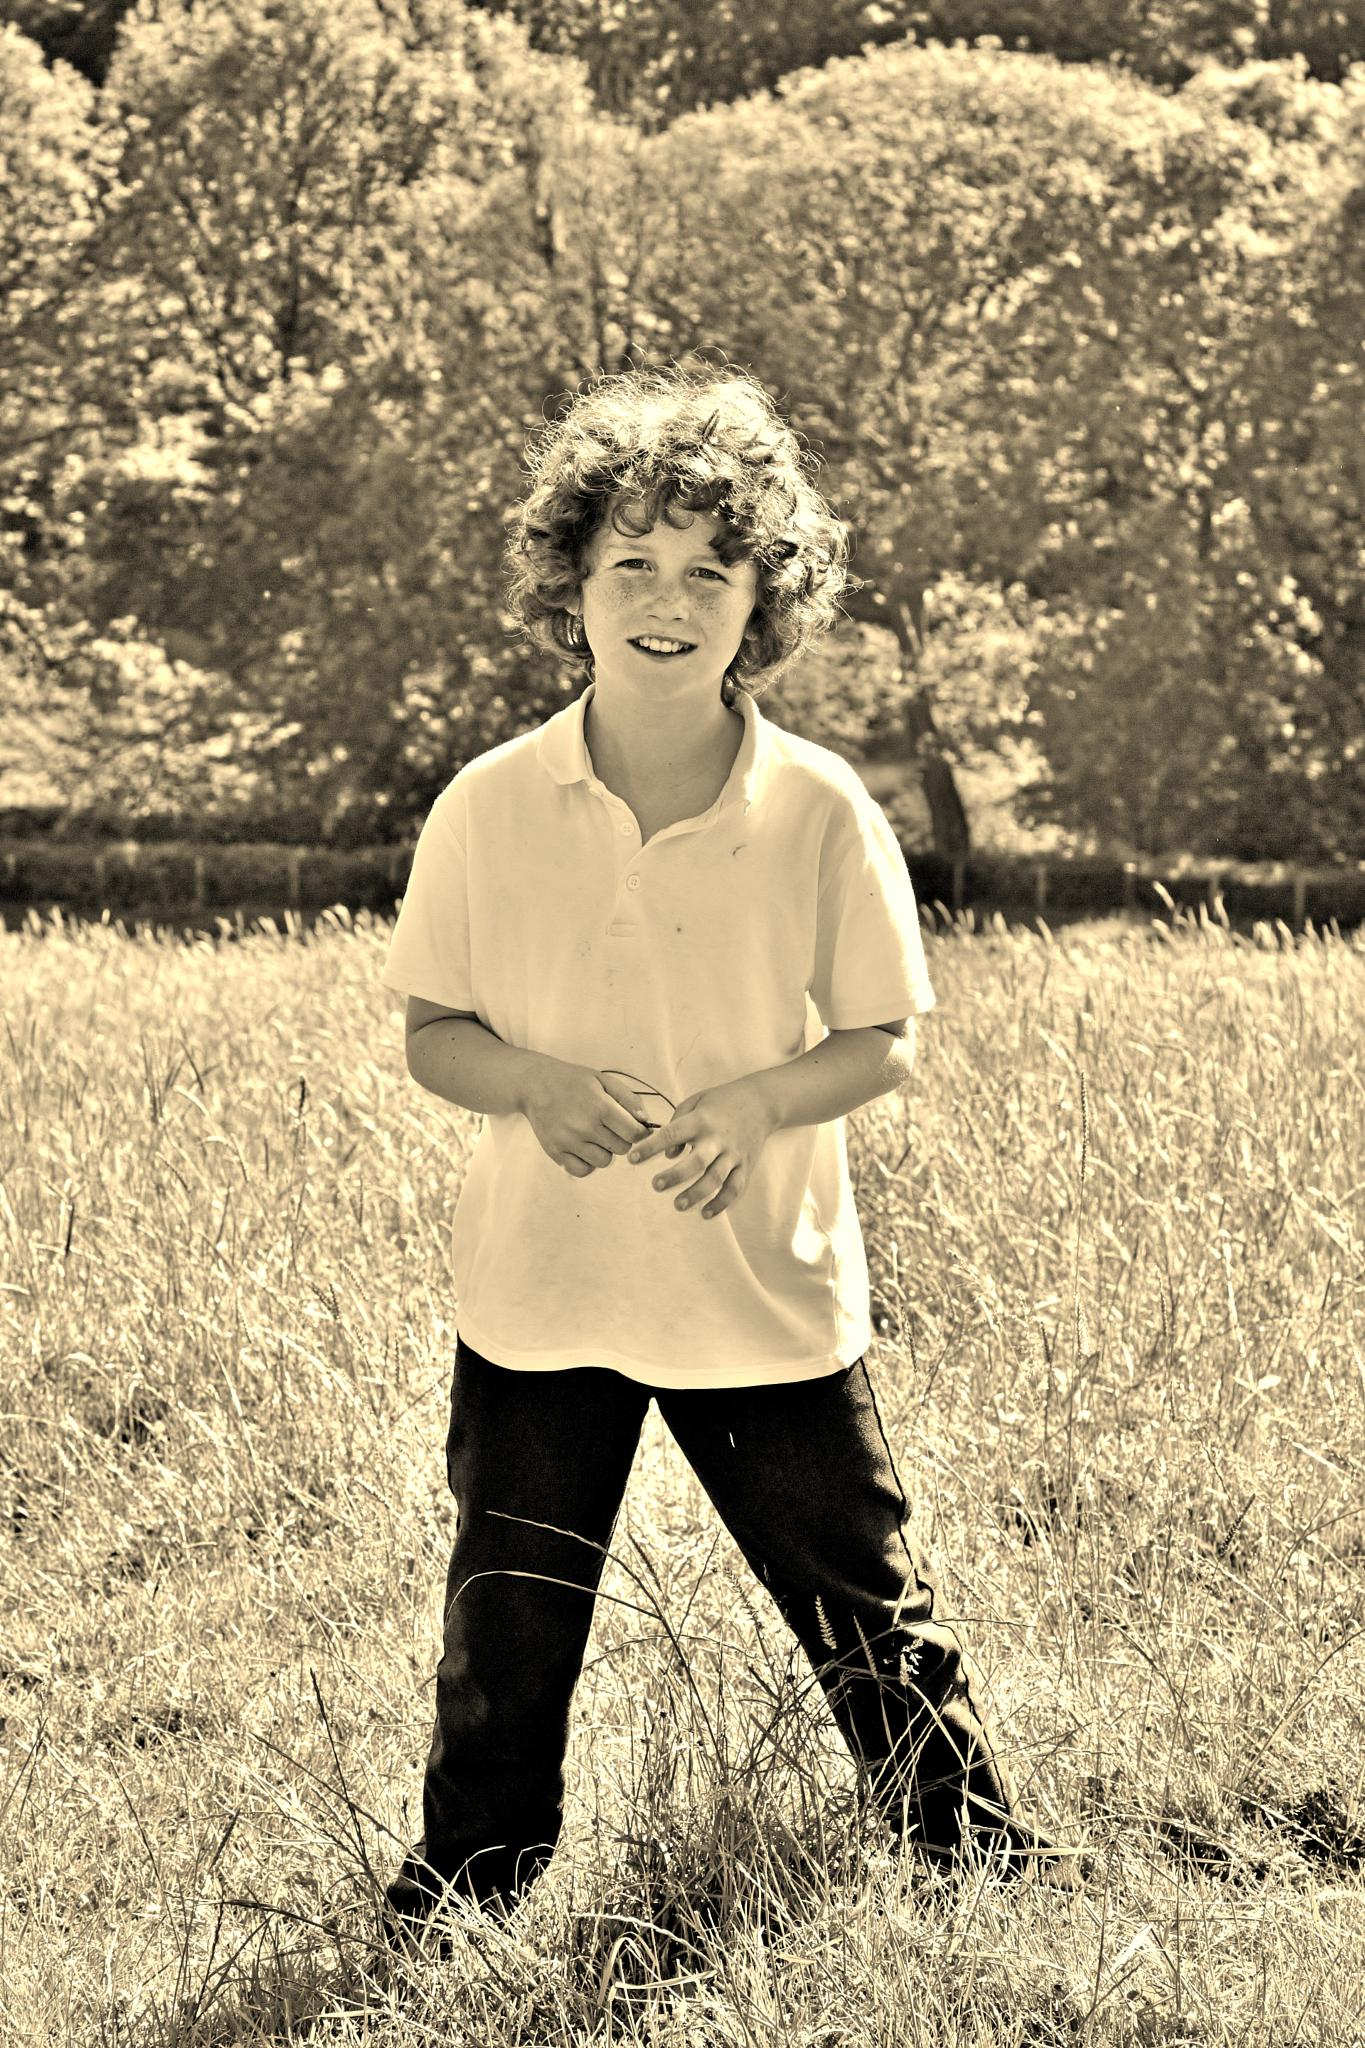 Boy in a Meadow - North Wales - Sepia by paul.hosker